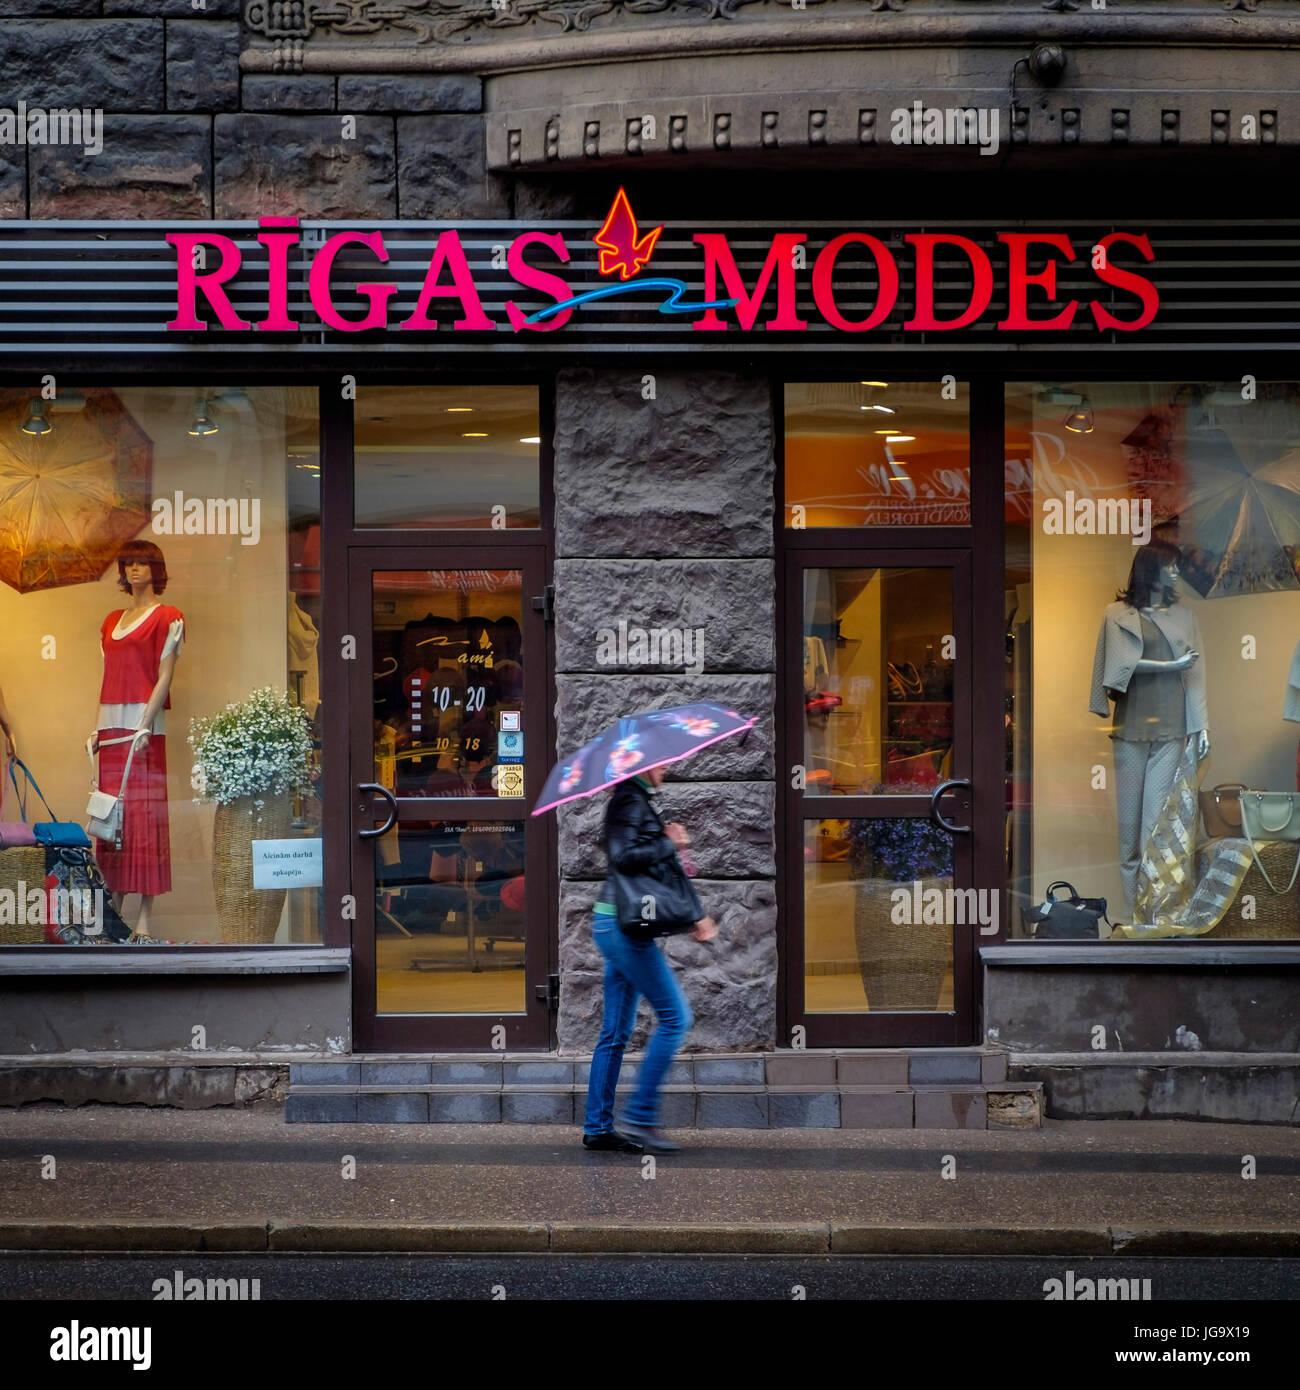 RIGA, LATVIA - CIRCA MAY 2014: Typical storefront in Marijas iela street in the center of Riga. - Stock Image